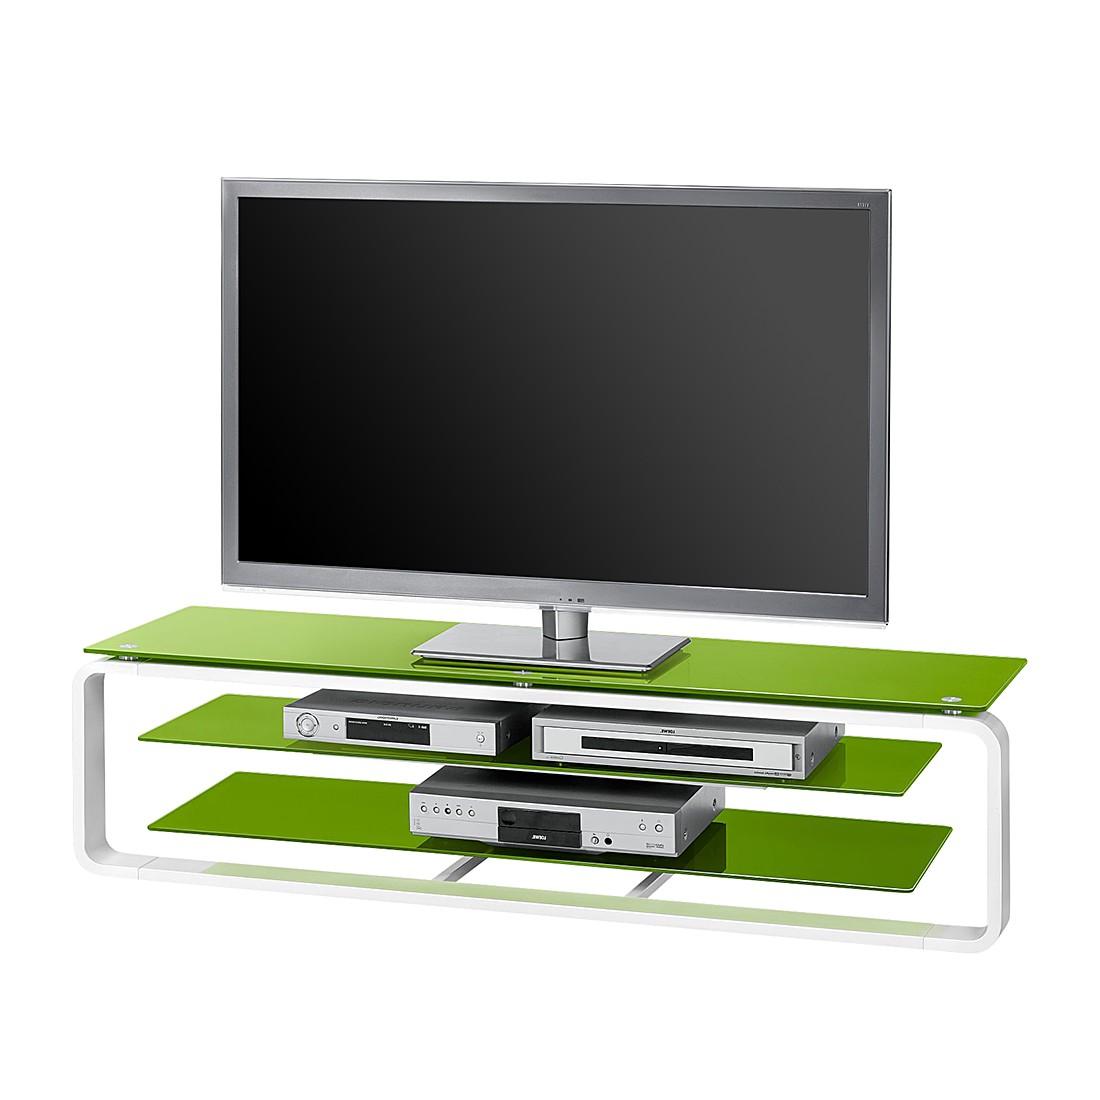 Tv-rek Jared I - Wit/groen glas - 150cm, Maja Möbel